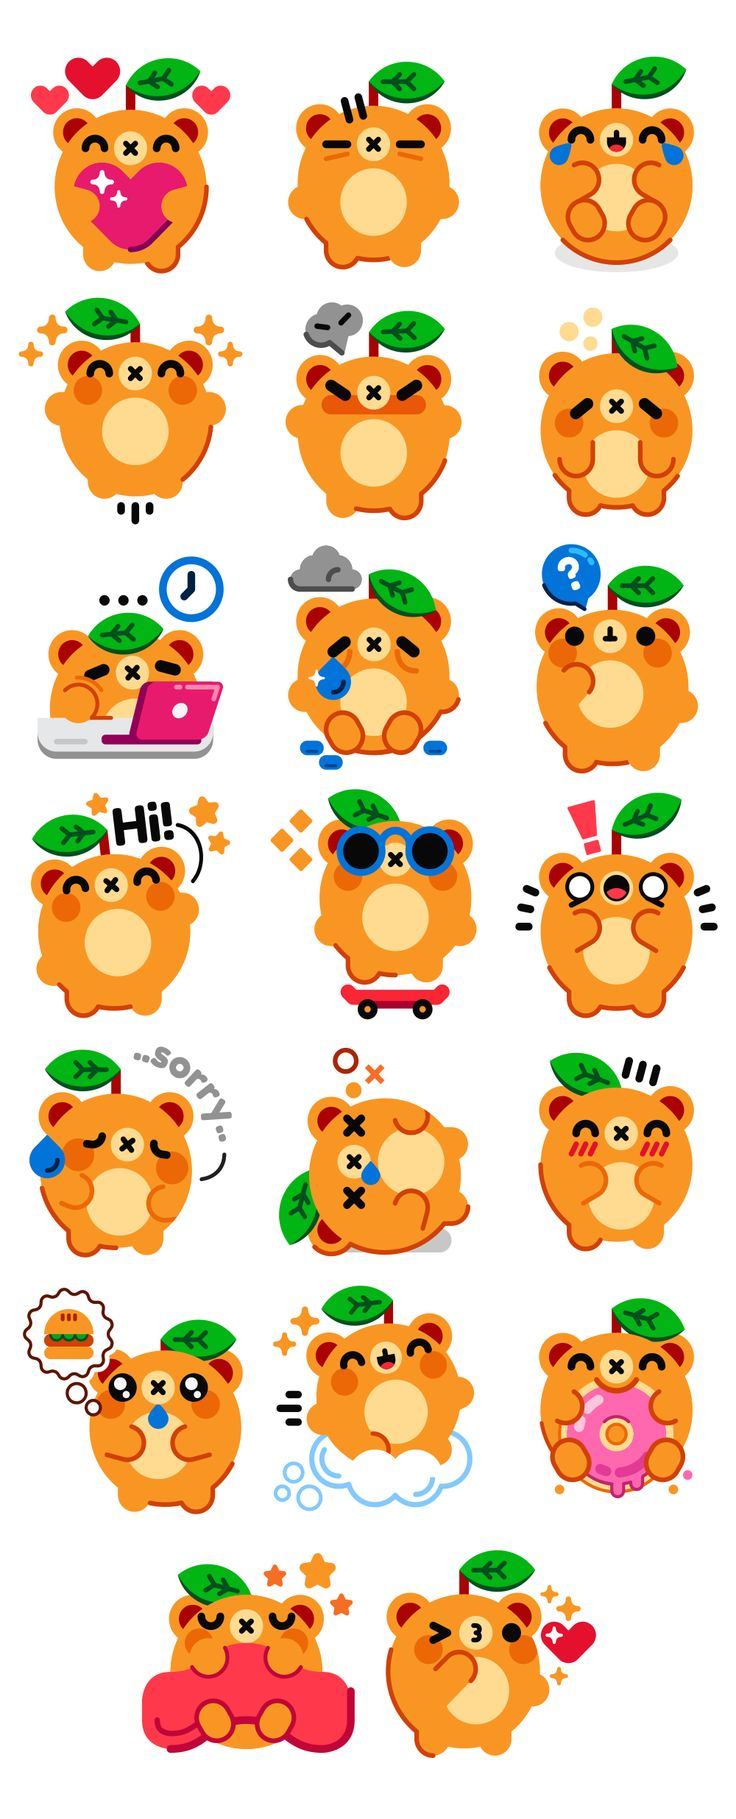 Naranja - Messenger App Sticker Pack - Illustrations by HeyHeyMomo